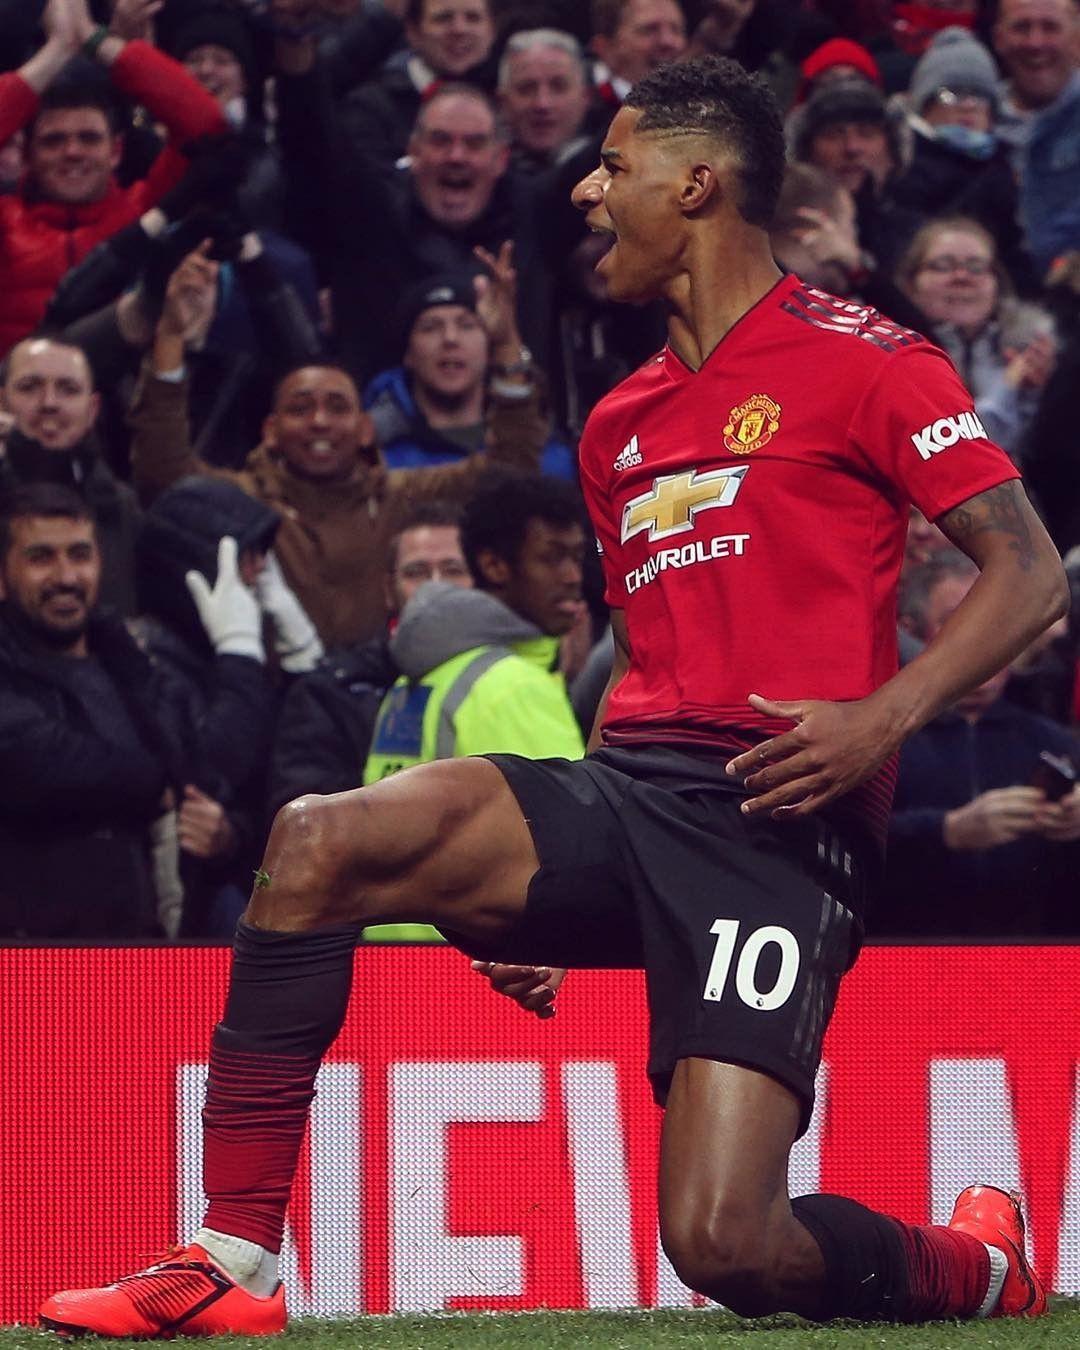 Get Beautiful Manchester United Wallpapers Rashford M-TEN RASHFORD